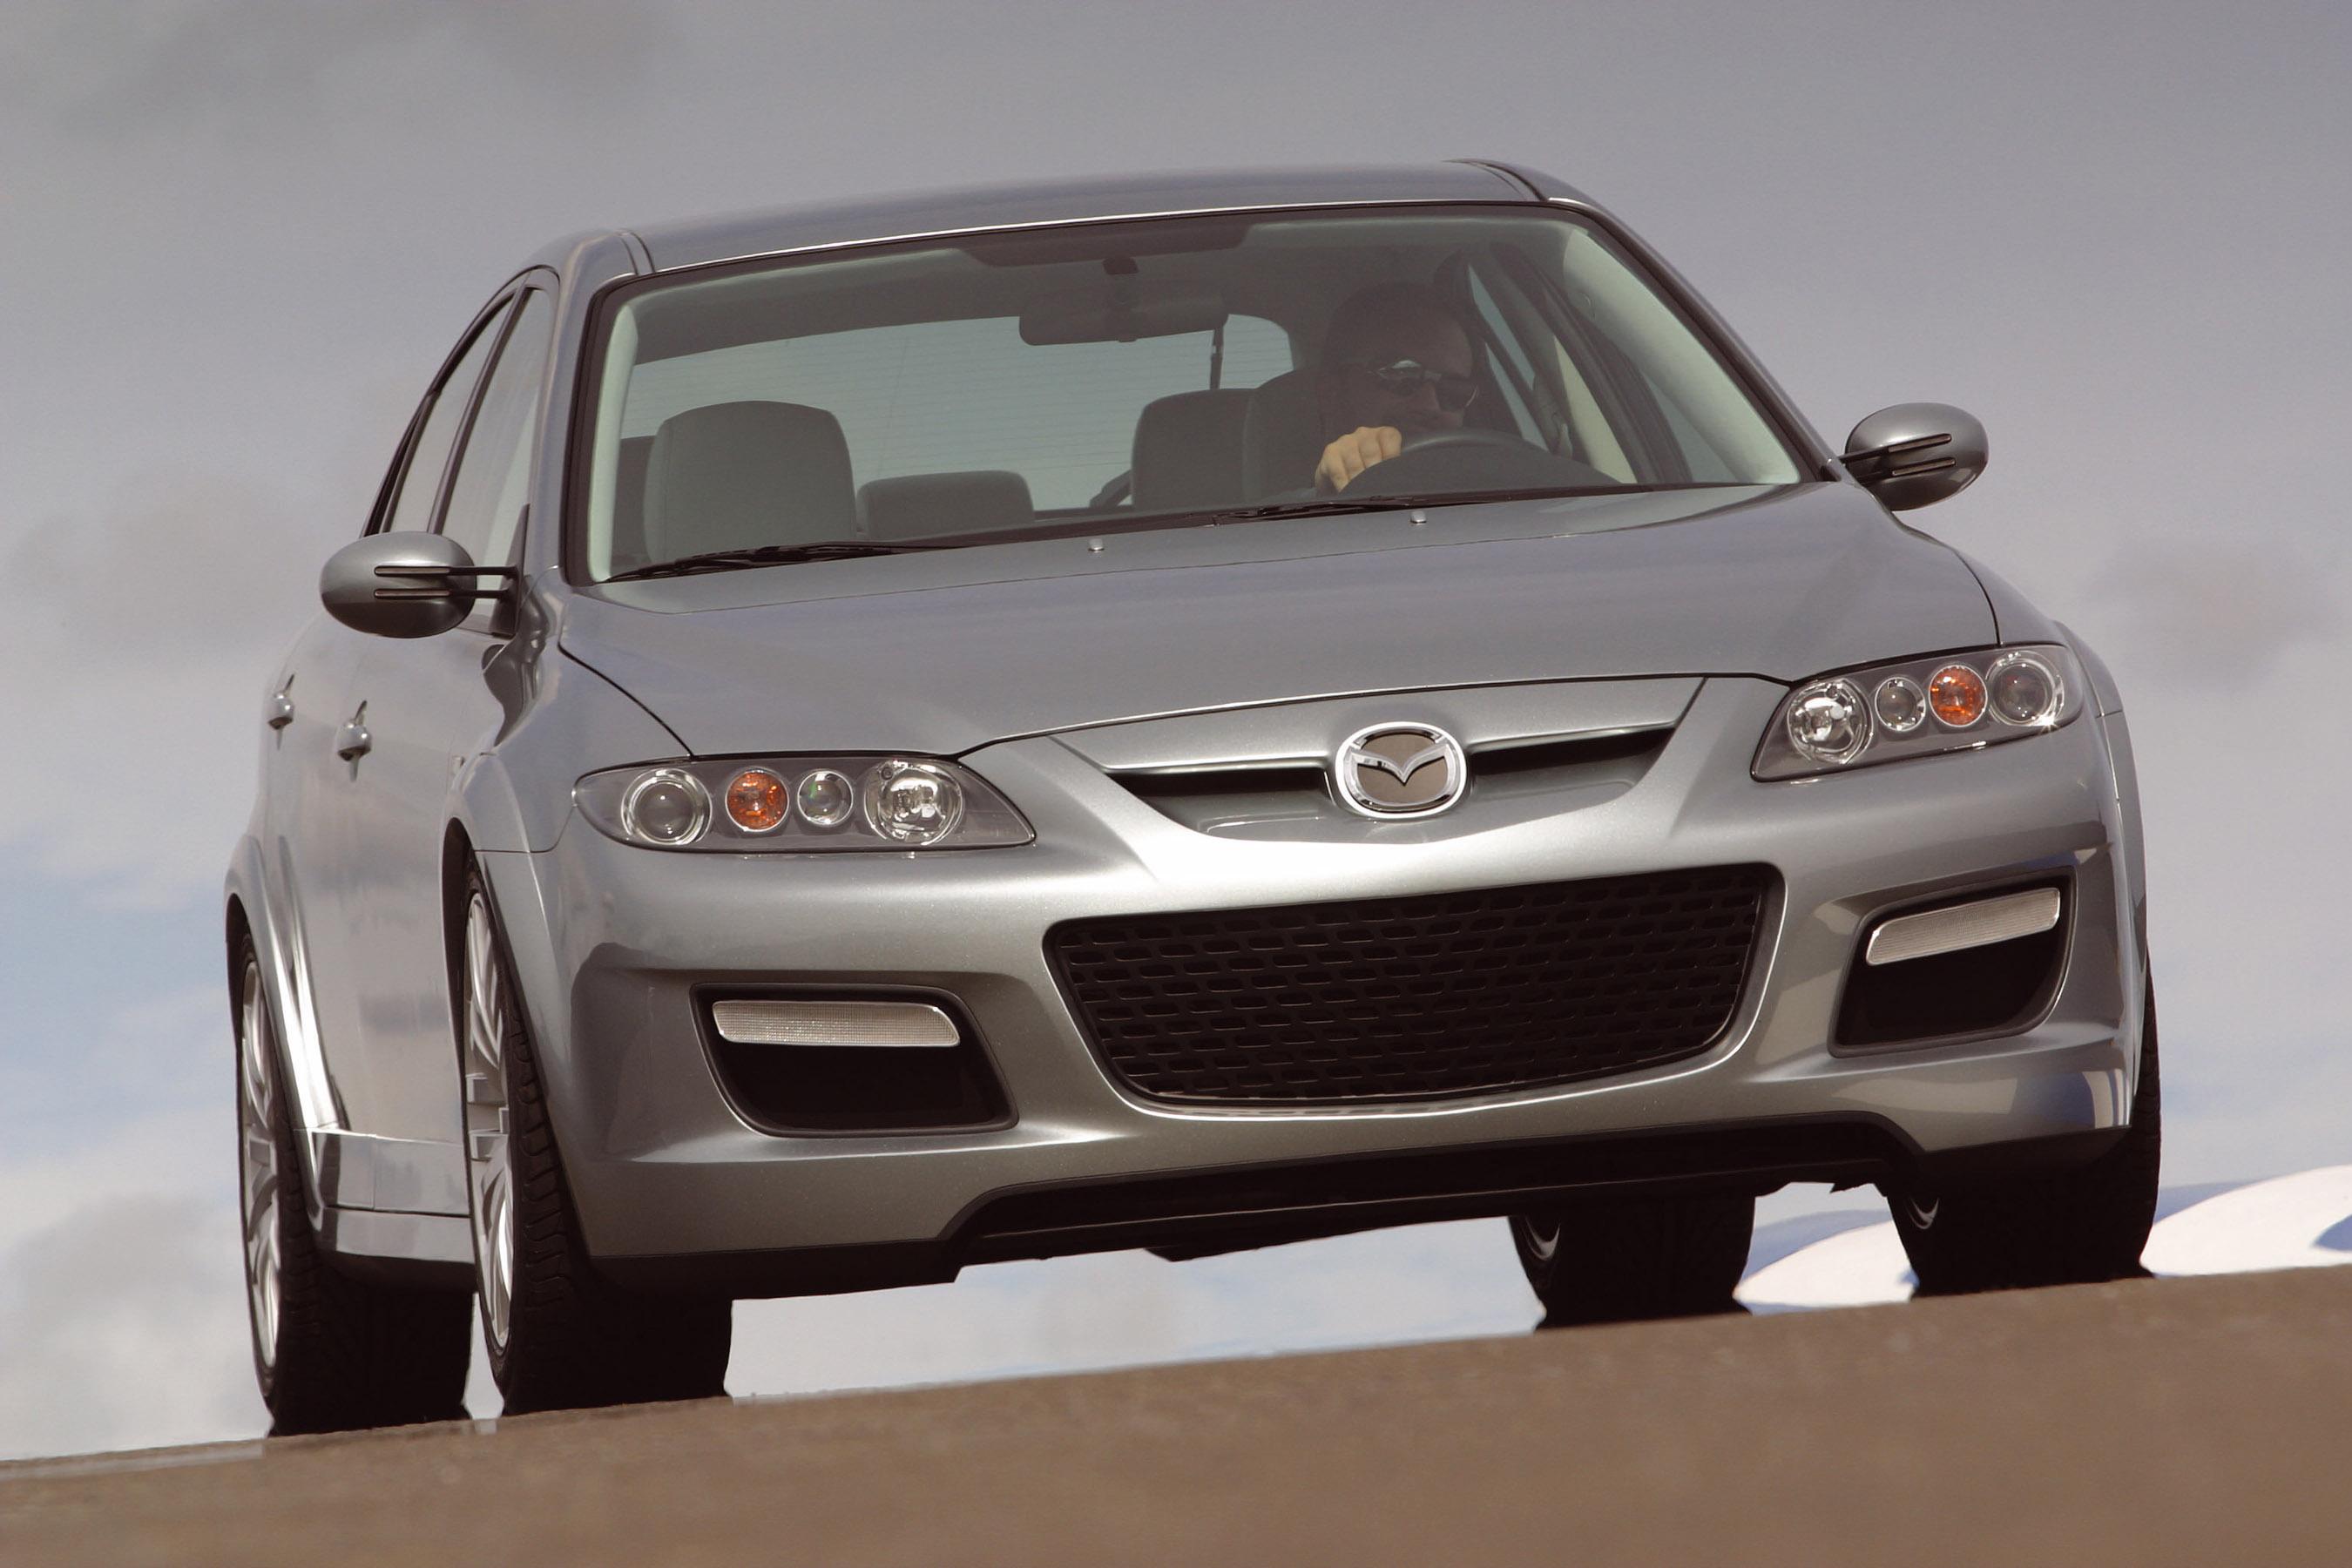 https://www.automobilesreview.com/img/2002-mazda-6-mps-concept/2002-mazda-6-mps-concept-02.jpg